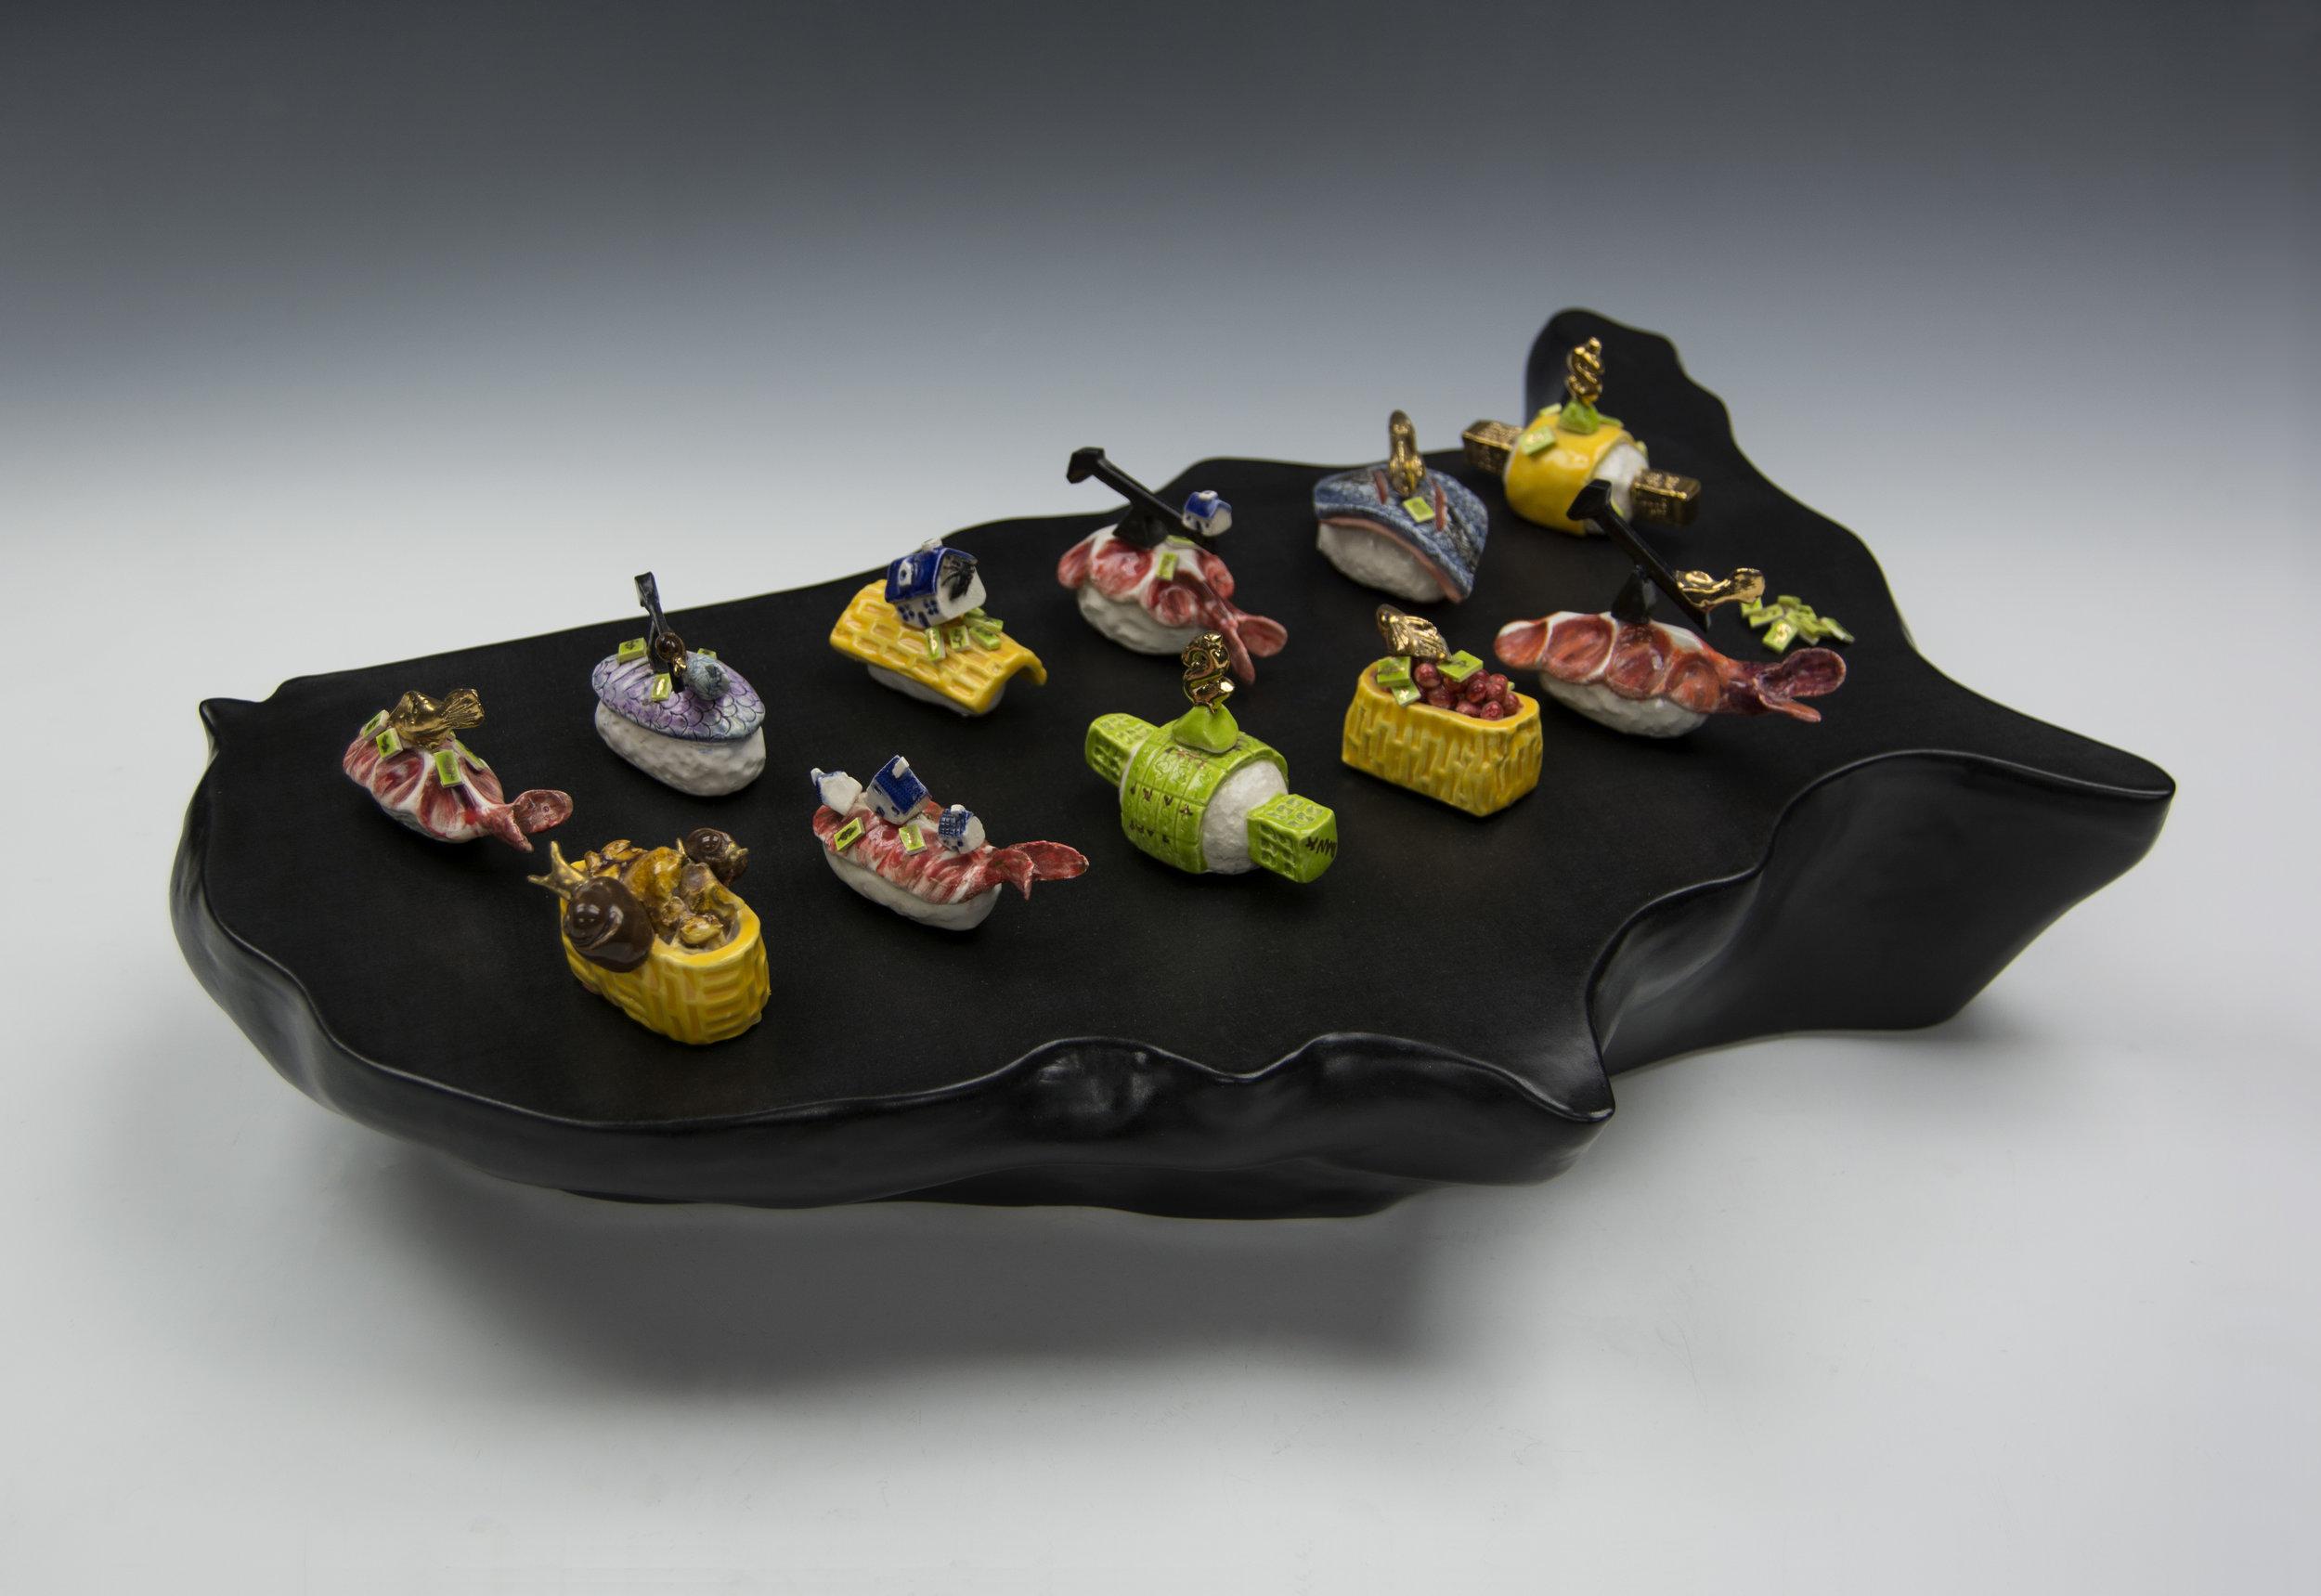 Sushi America's Fast Food